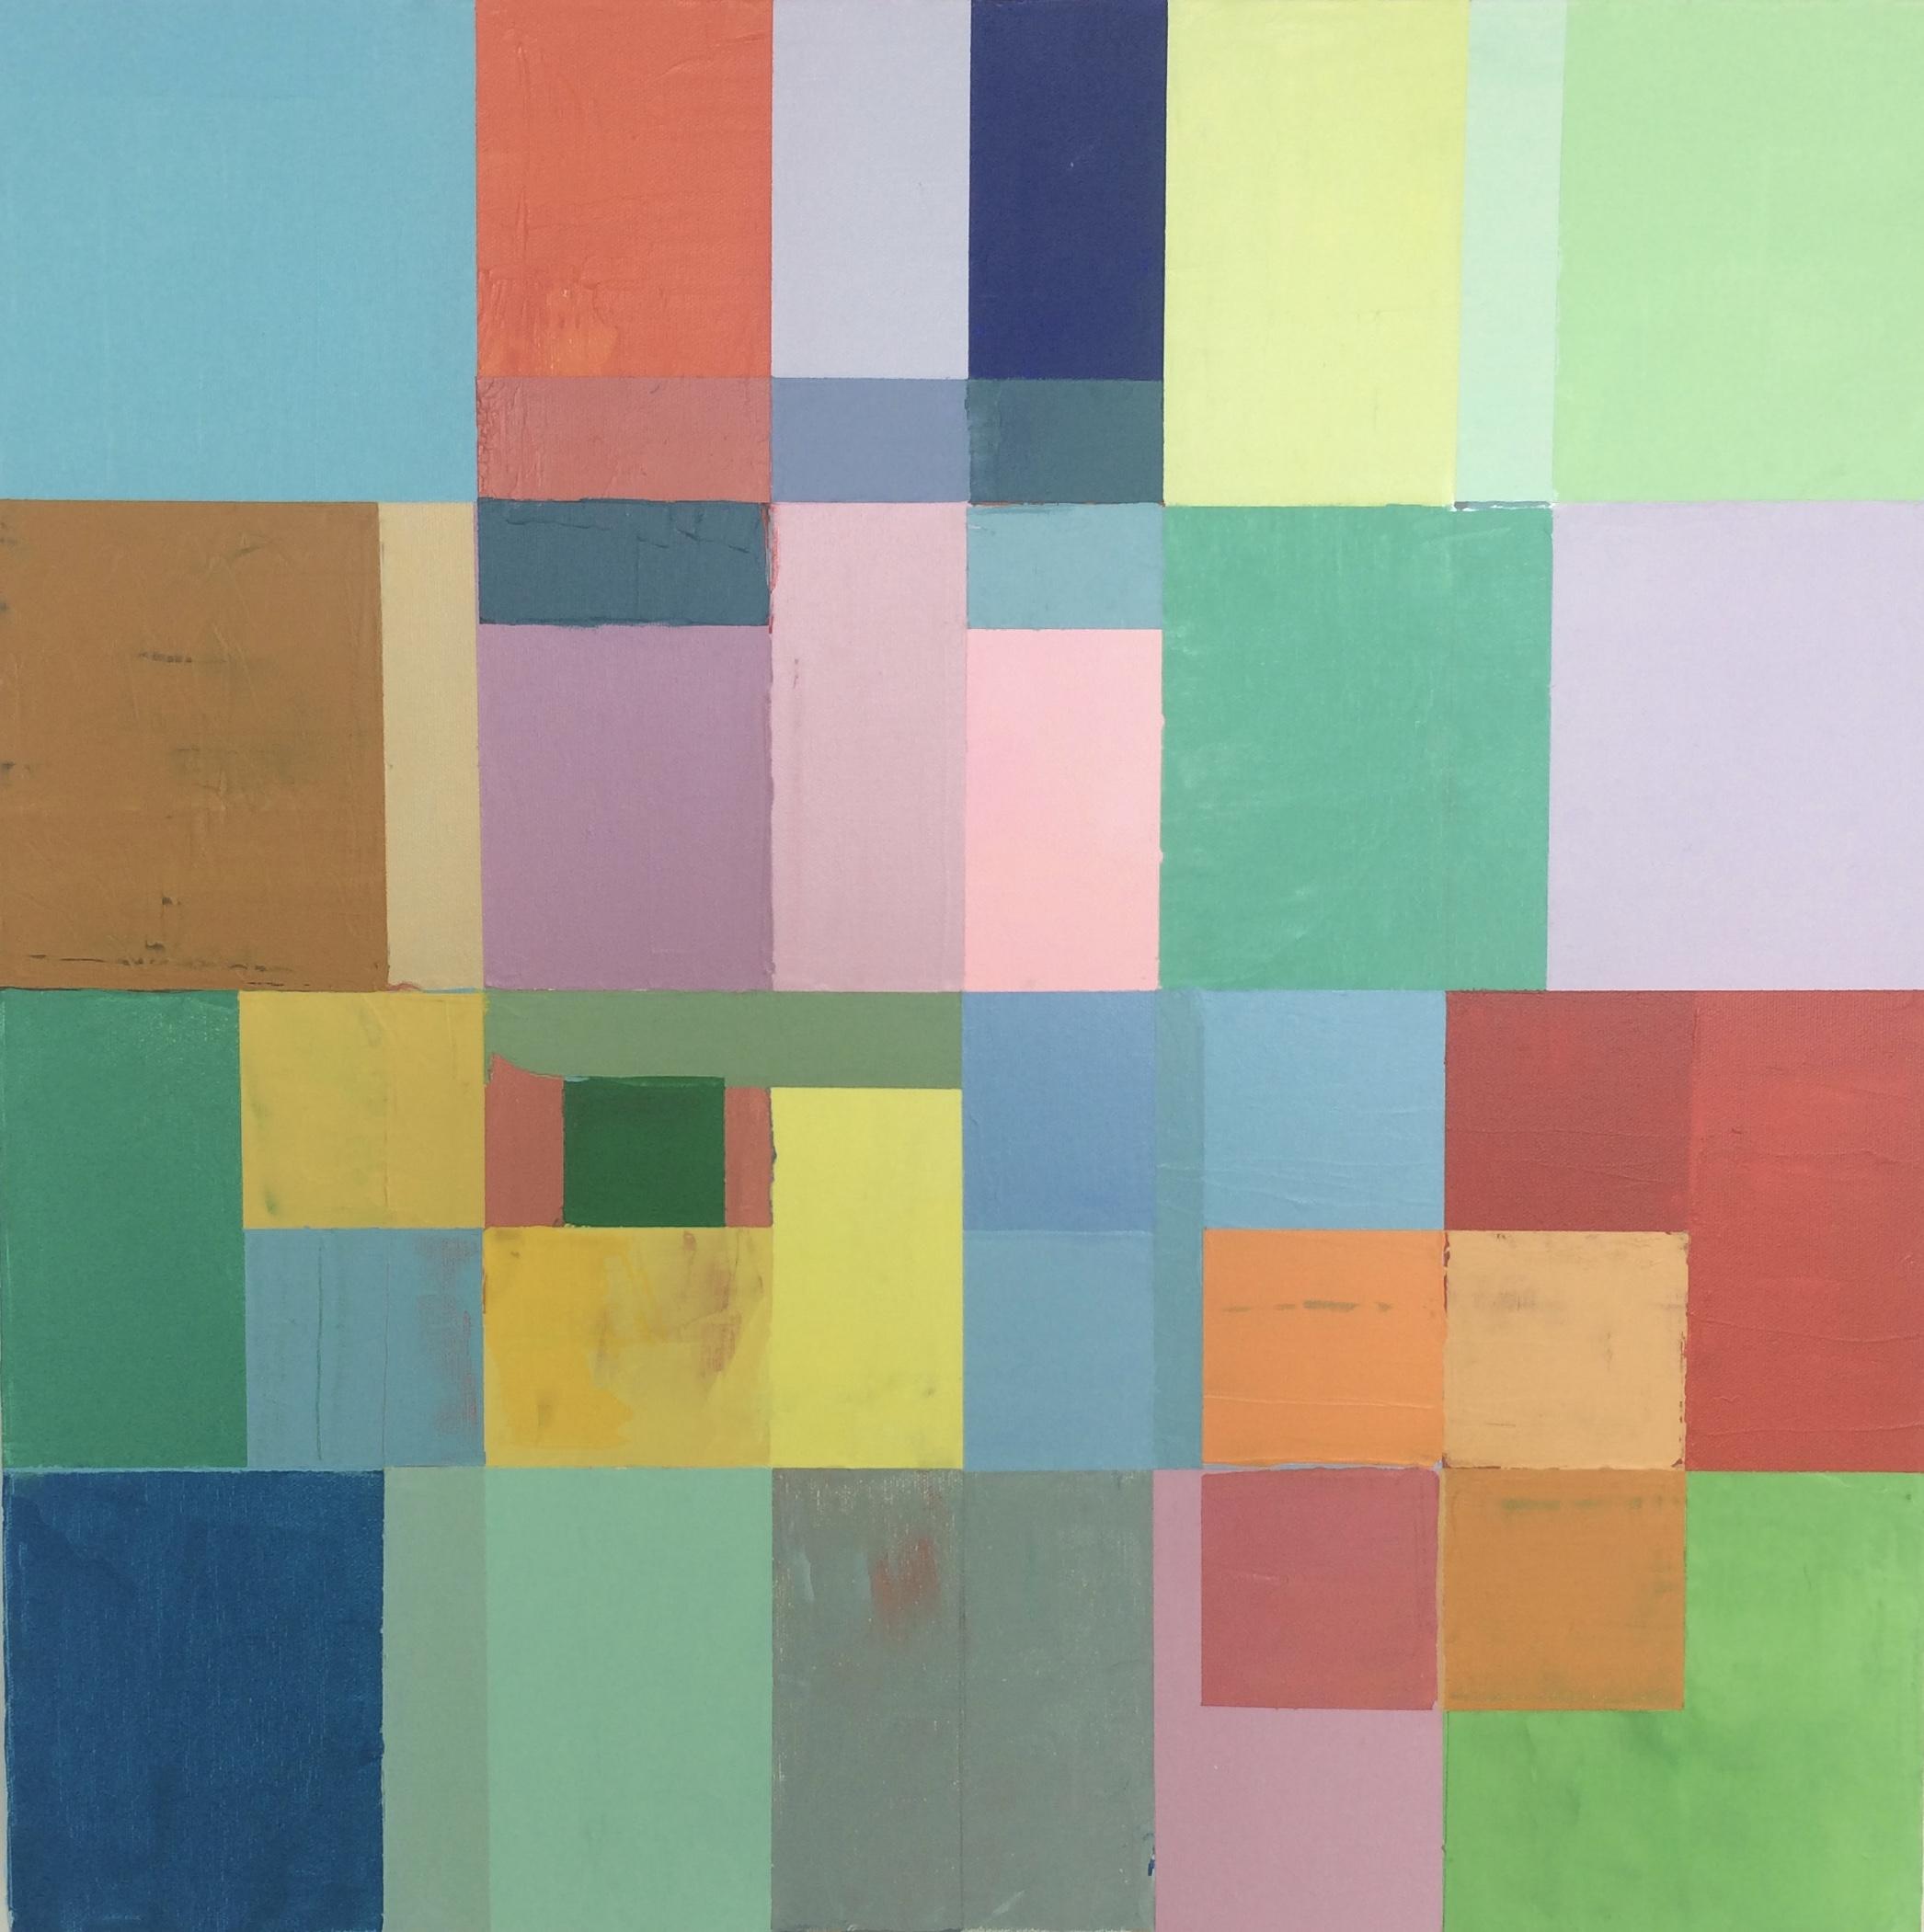 Block-us 5 - 2014 - 24x24 Acrylic on canvas